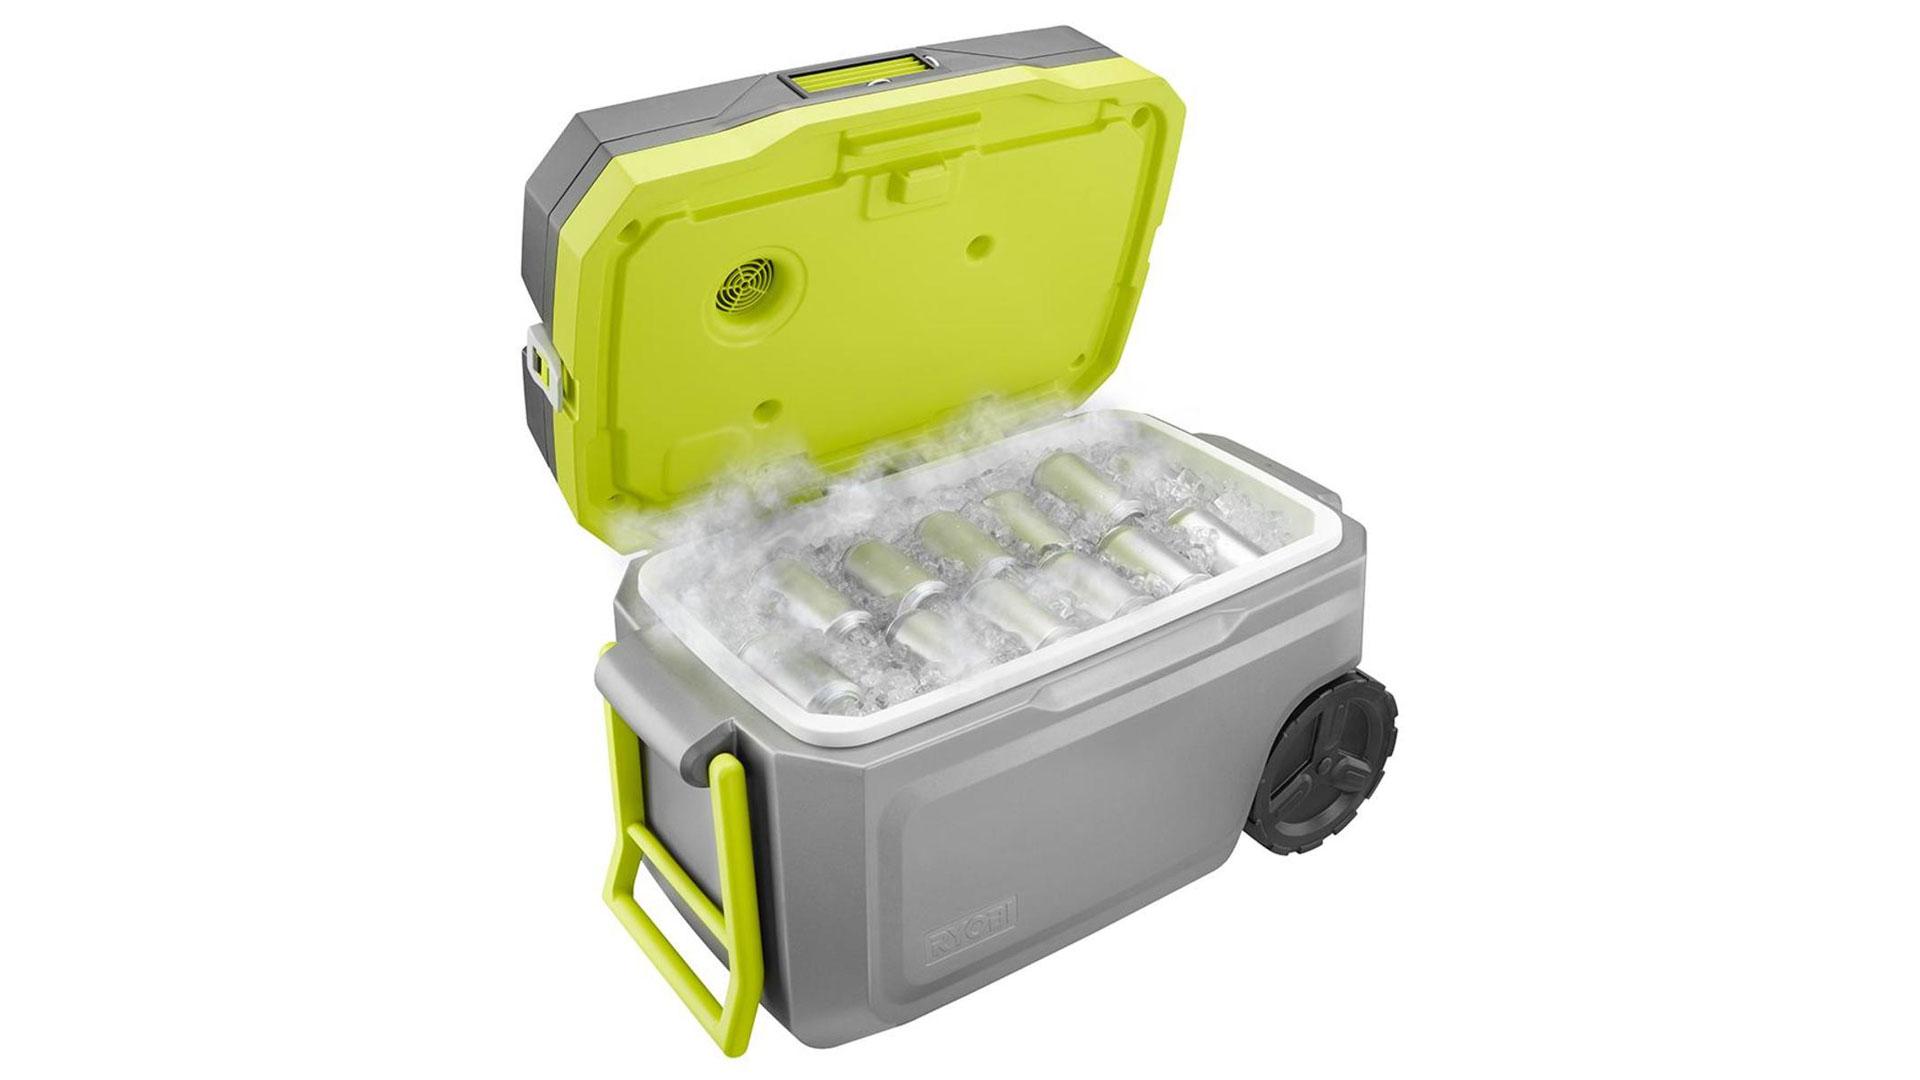 Ryobi Air Conditioner Cooler Koelbox